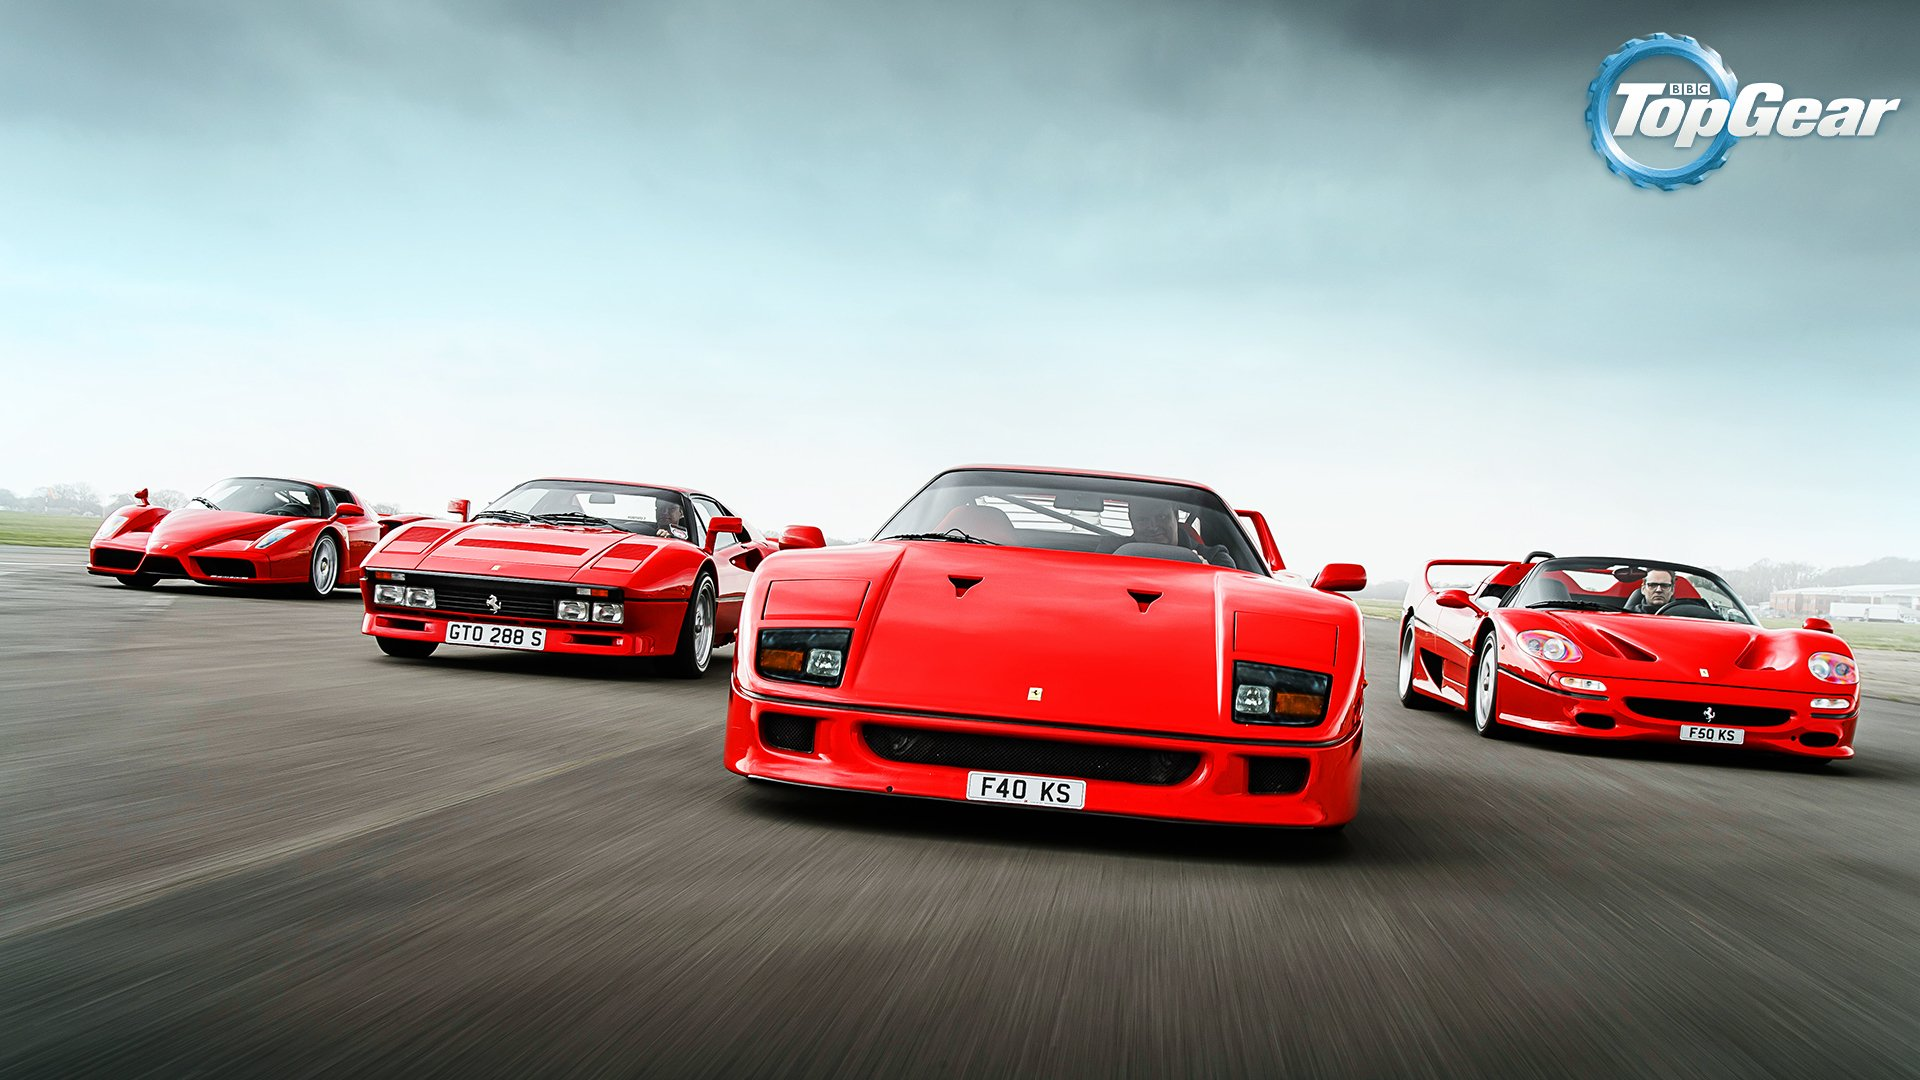 TV Show - Top Gear  Ferrari 288 GTO Ferrari F50 Ferrari F40 Wallpaper